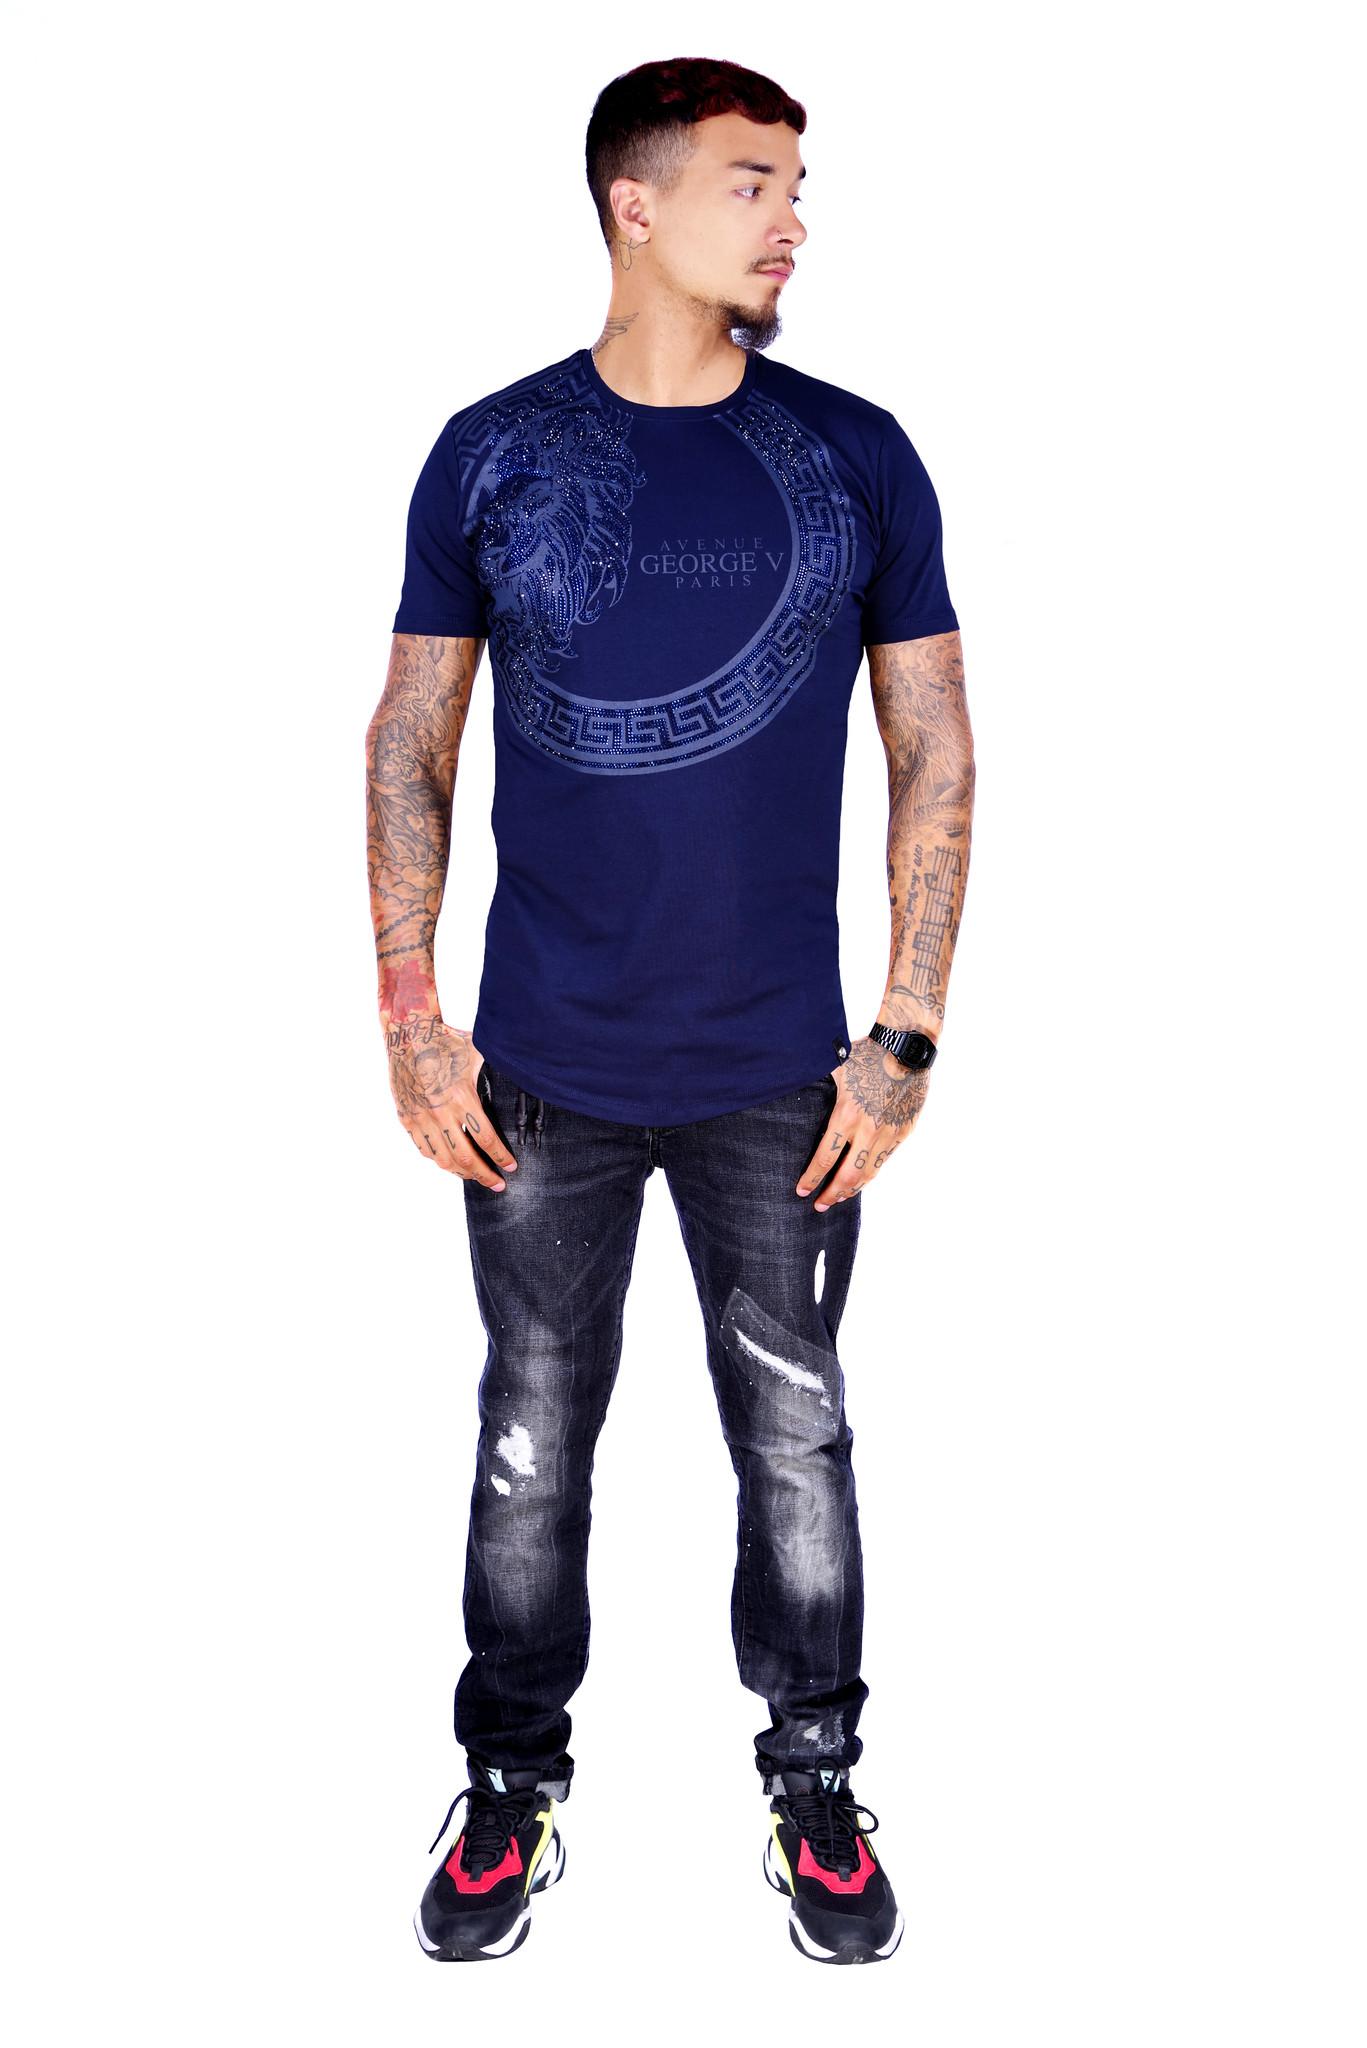 George V T-Shirt 5 XS